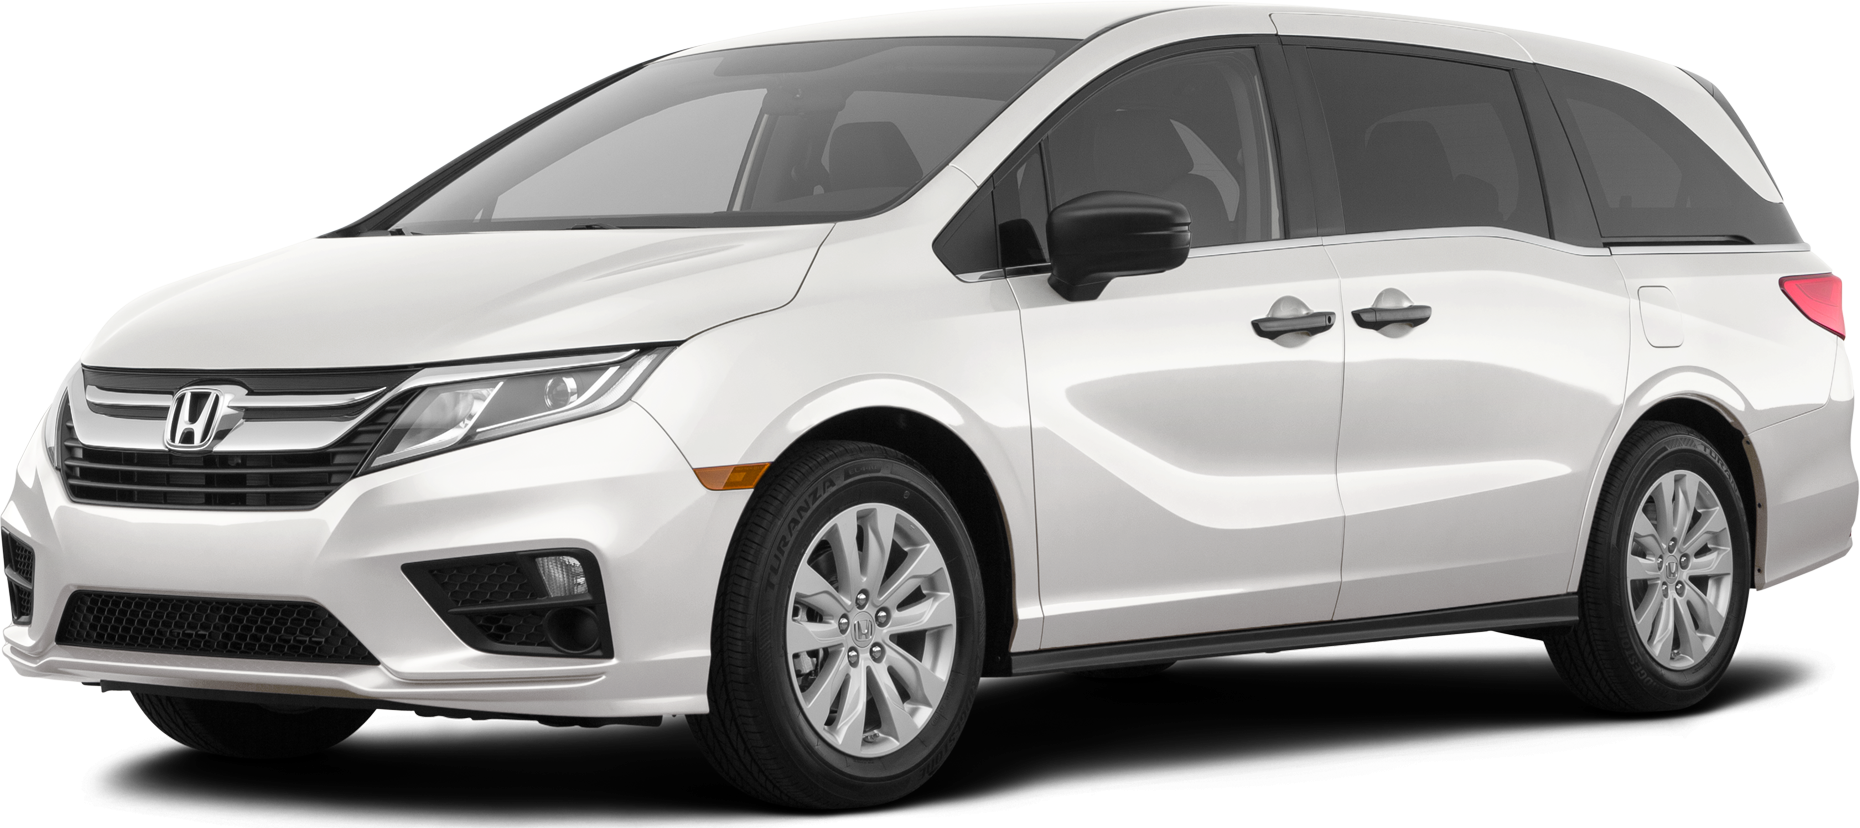 NEW 2019 Odyssey LX FWD CVT